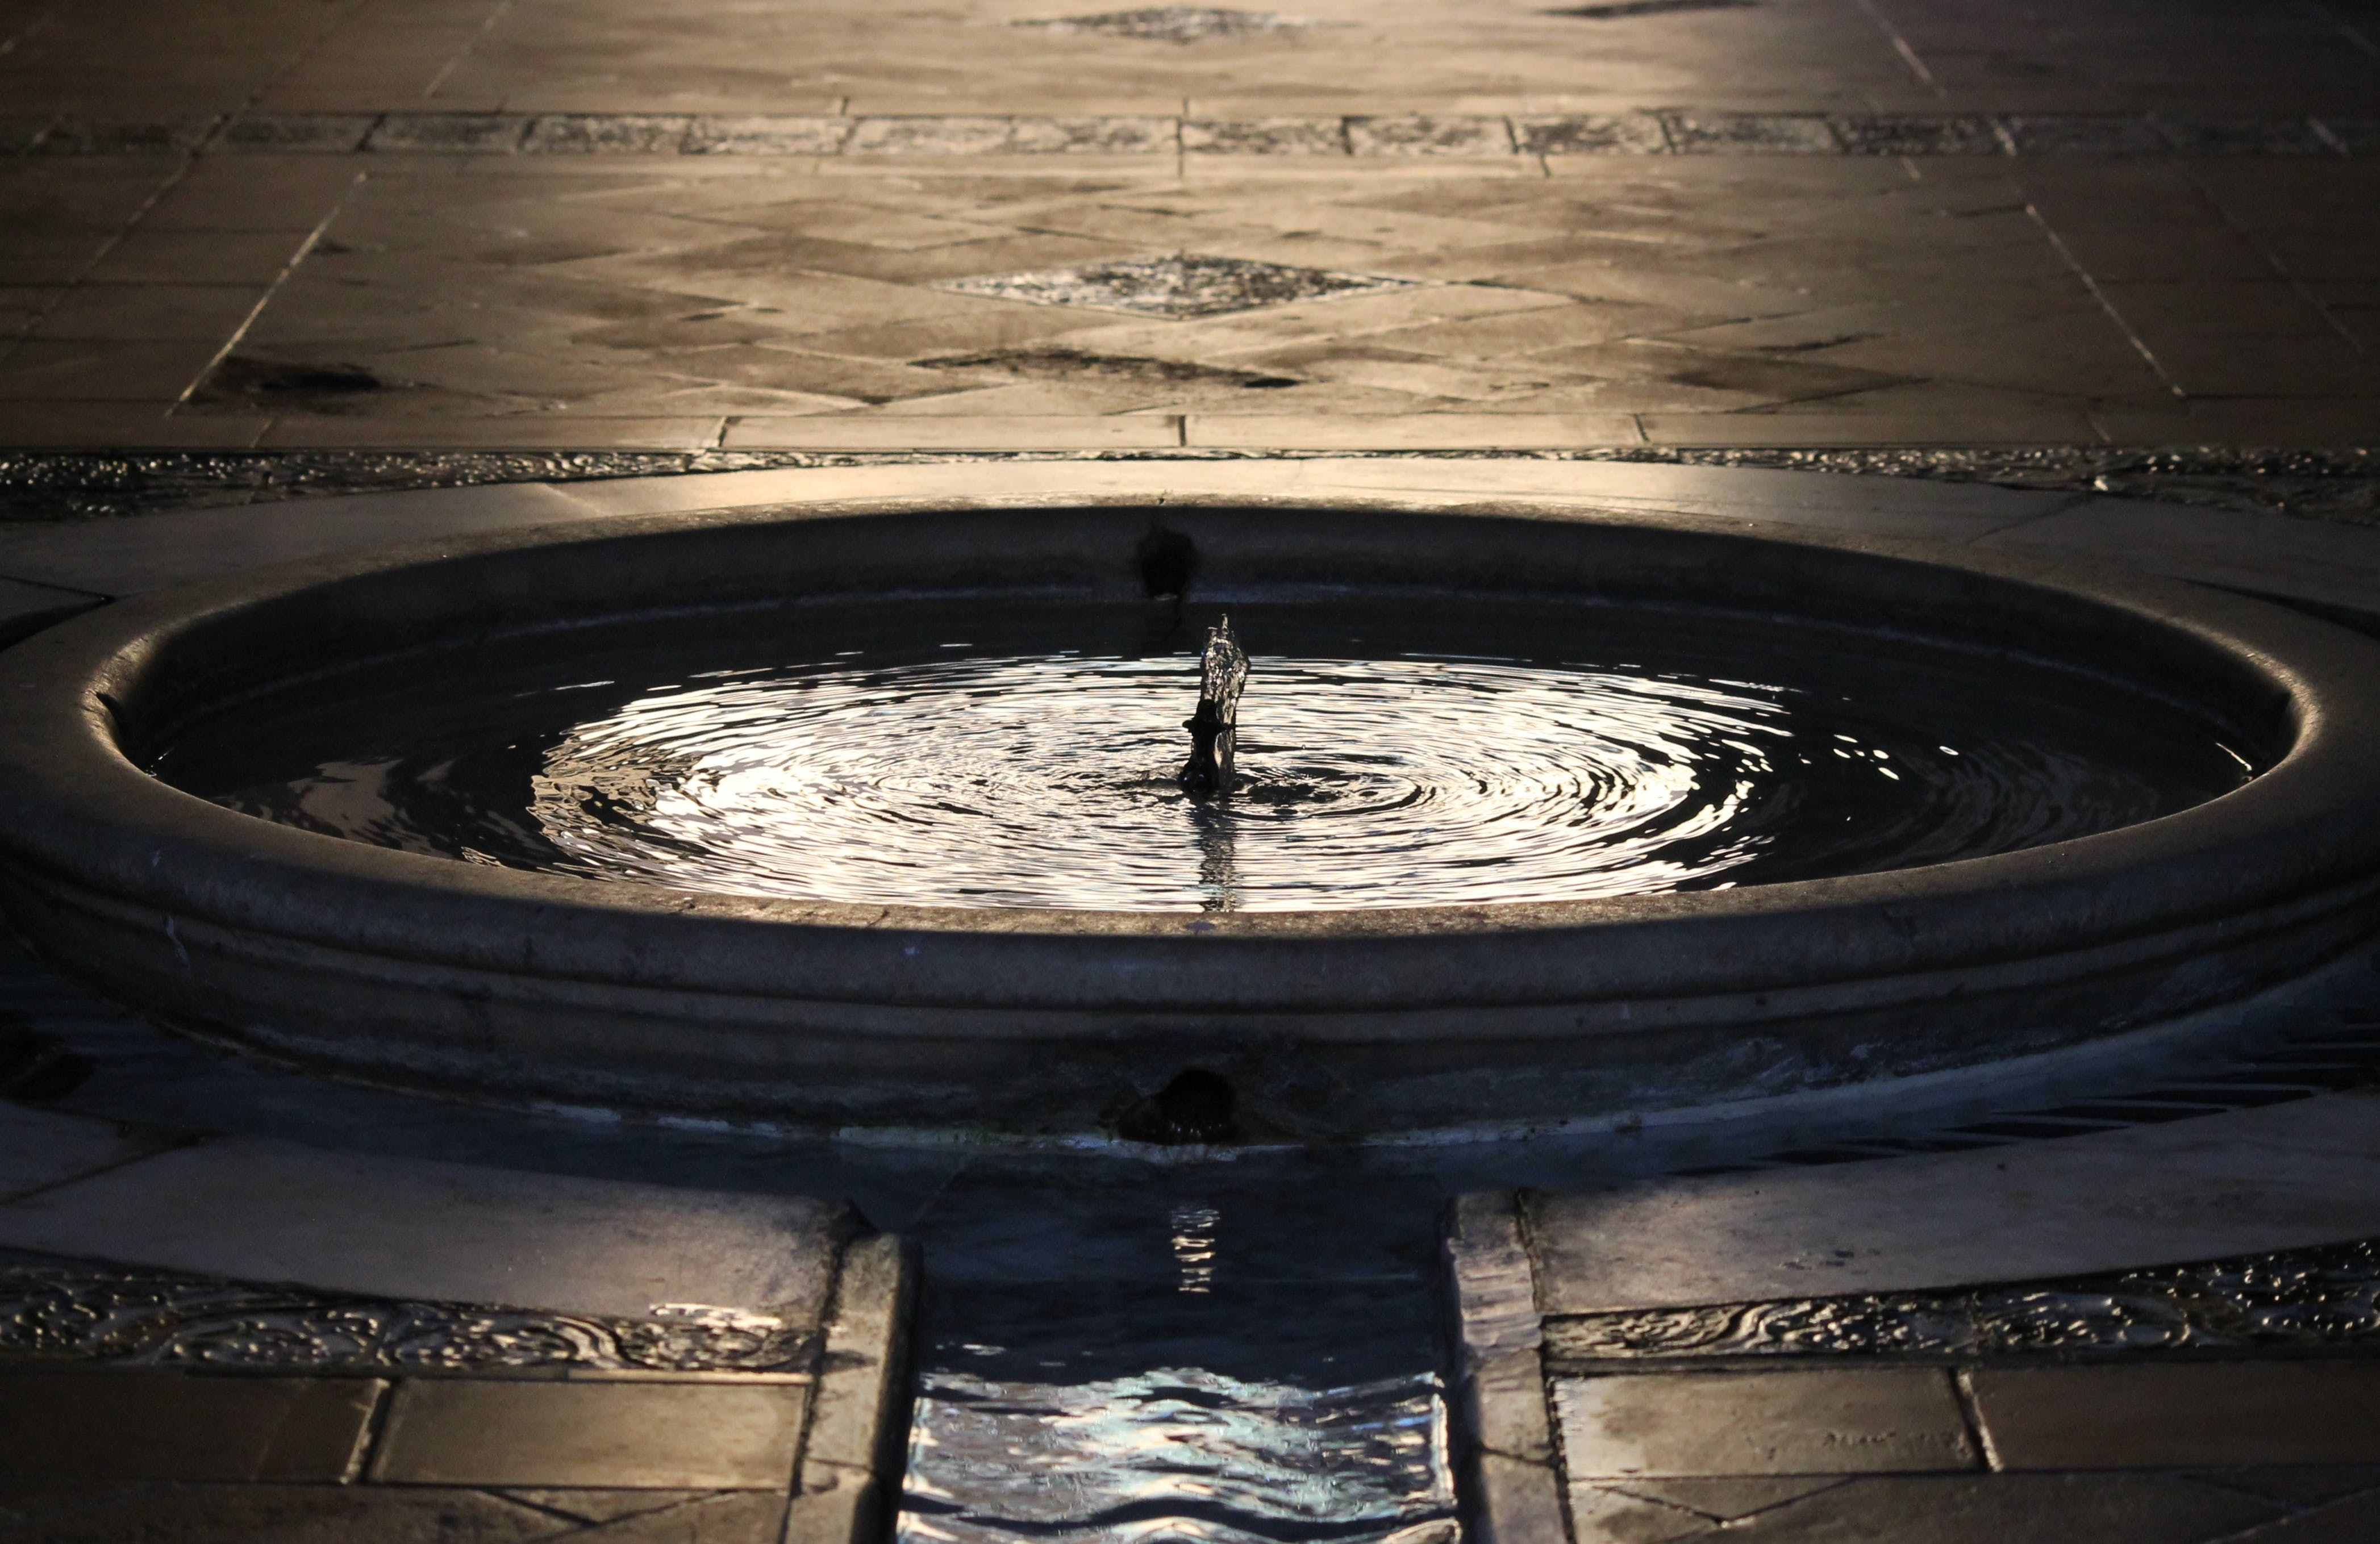 Water in Concrete Fountain